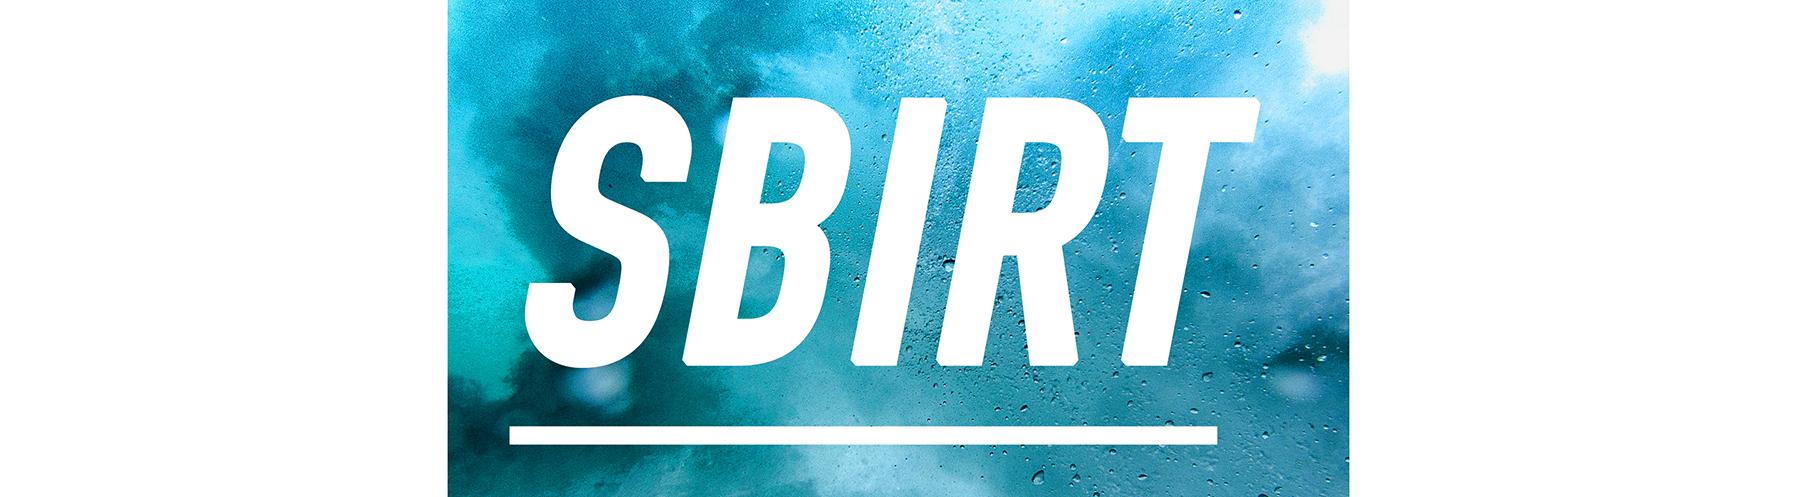 SBIRT banner.png